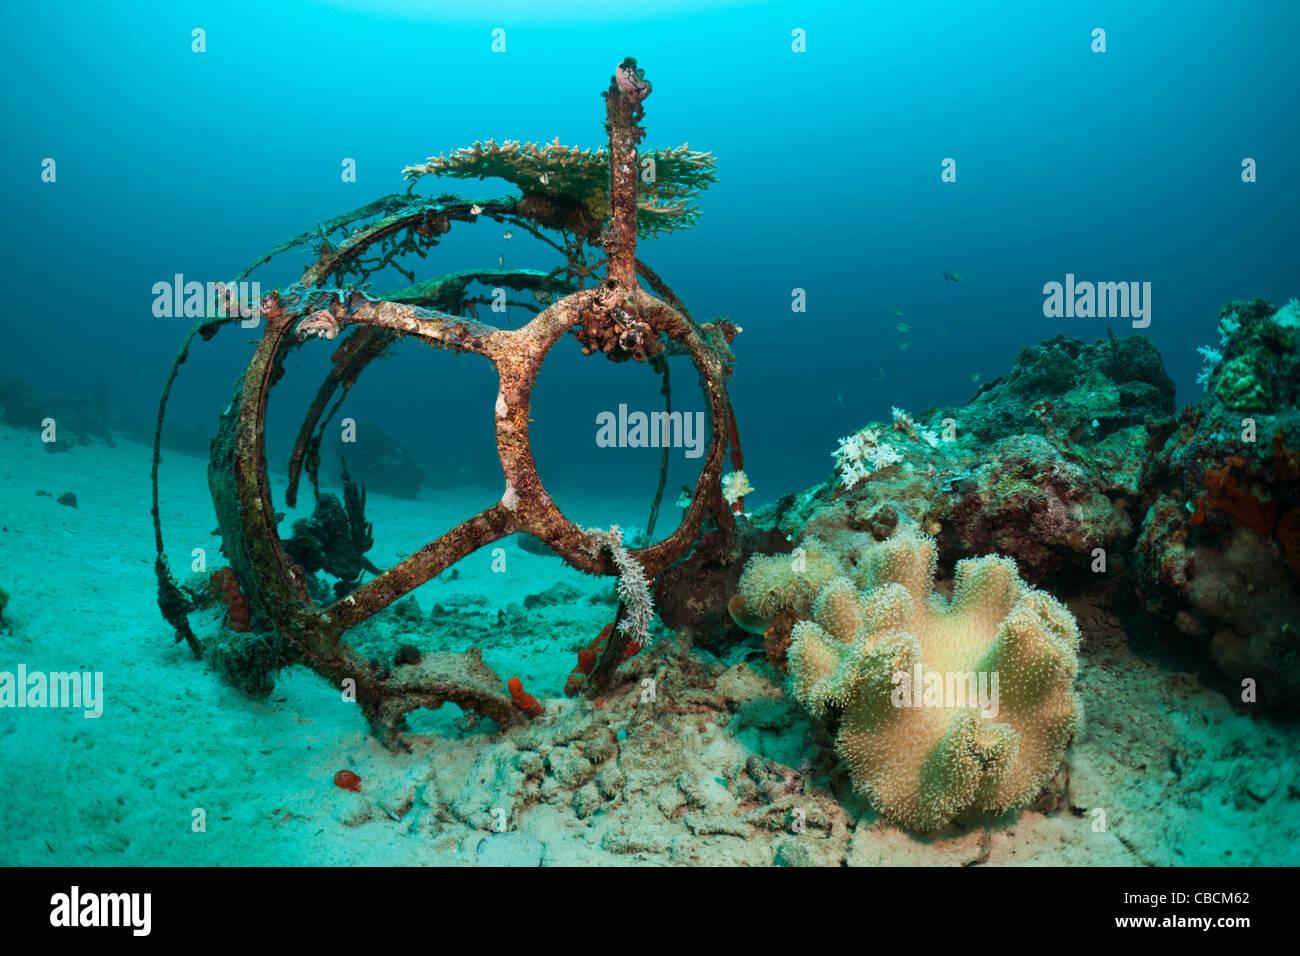 Aeroplane Wreckage at Ahe Housreef, Cenderawasih Bay, West Papua, Indonesia - Stock Image